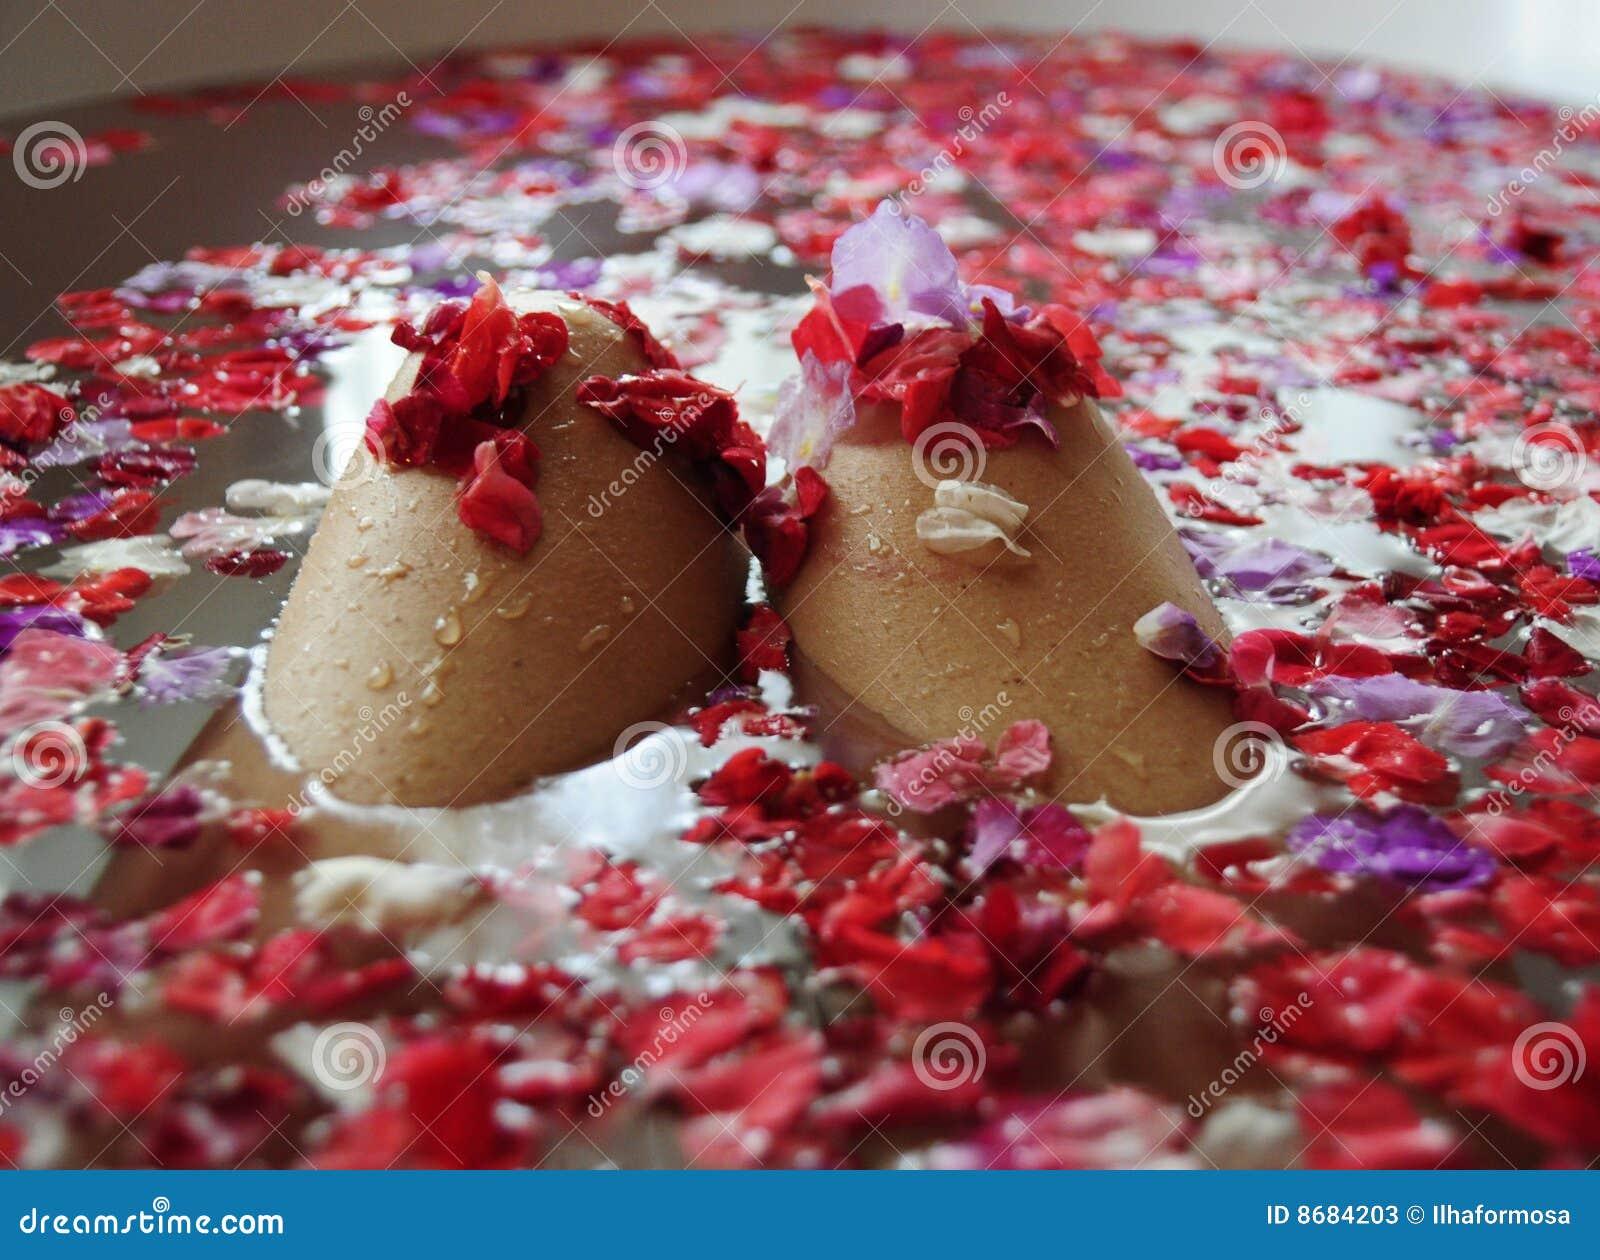 Femme rose de p tales de genoux de bain photos stock - Petale de rose bain ...